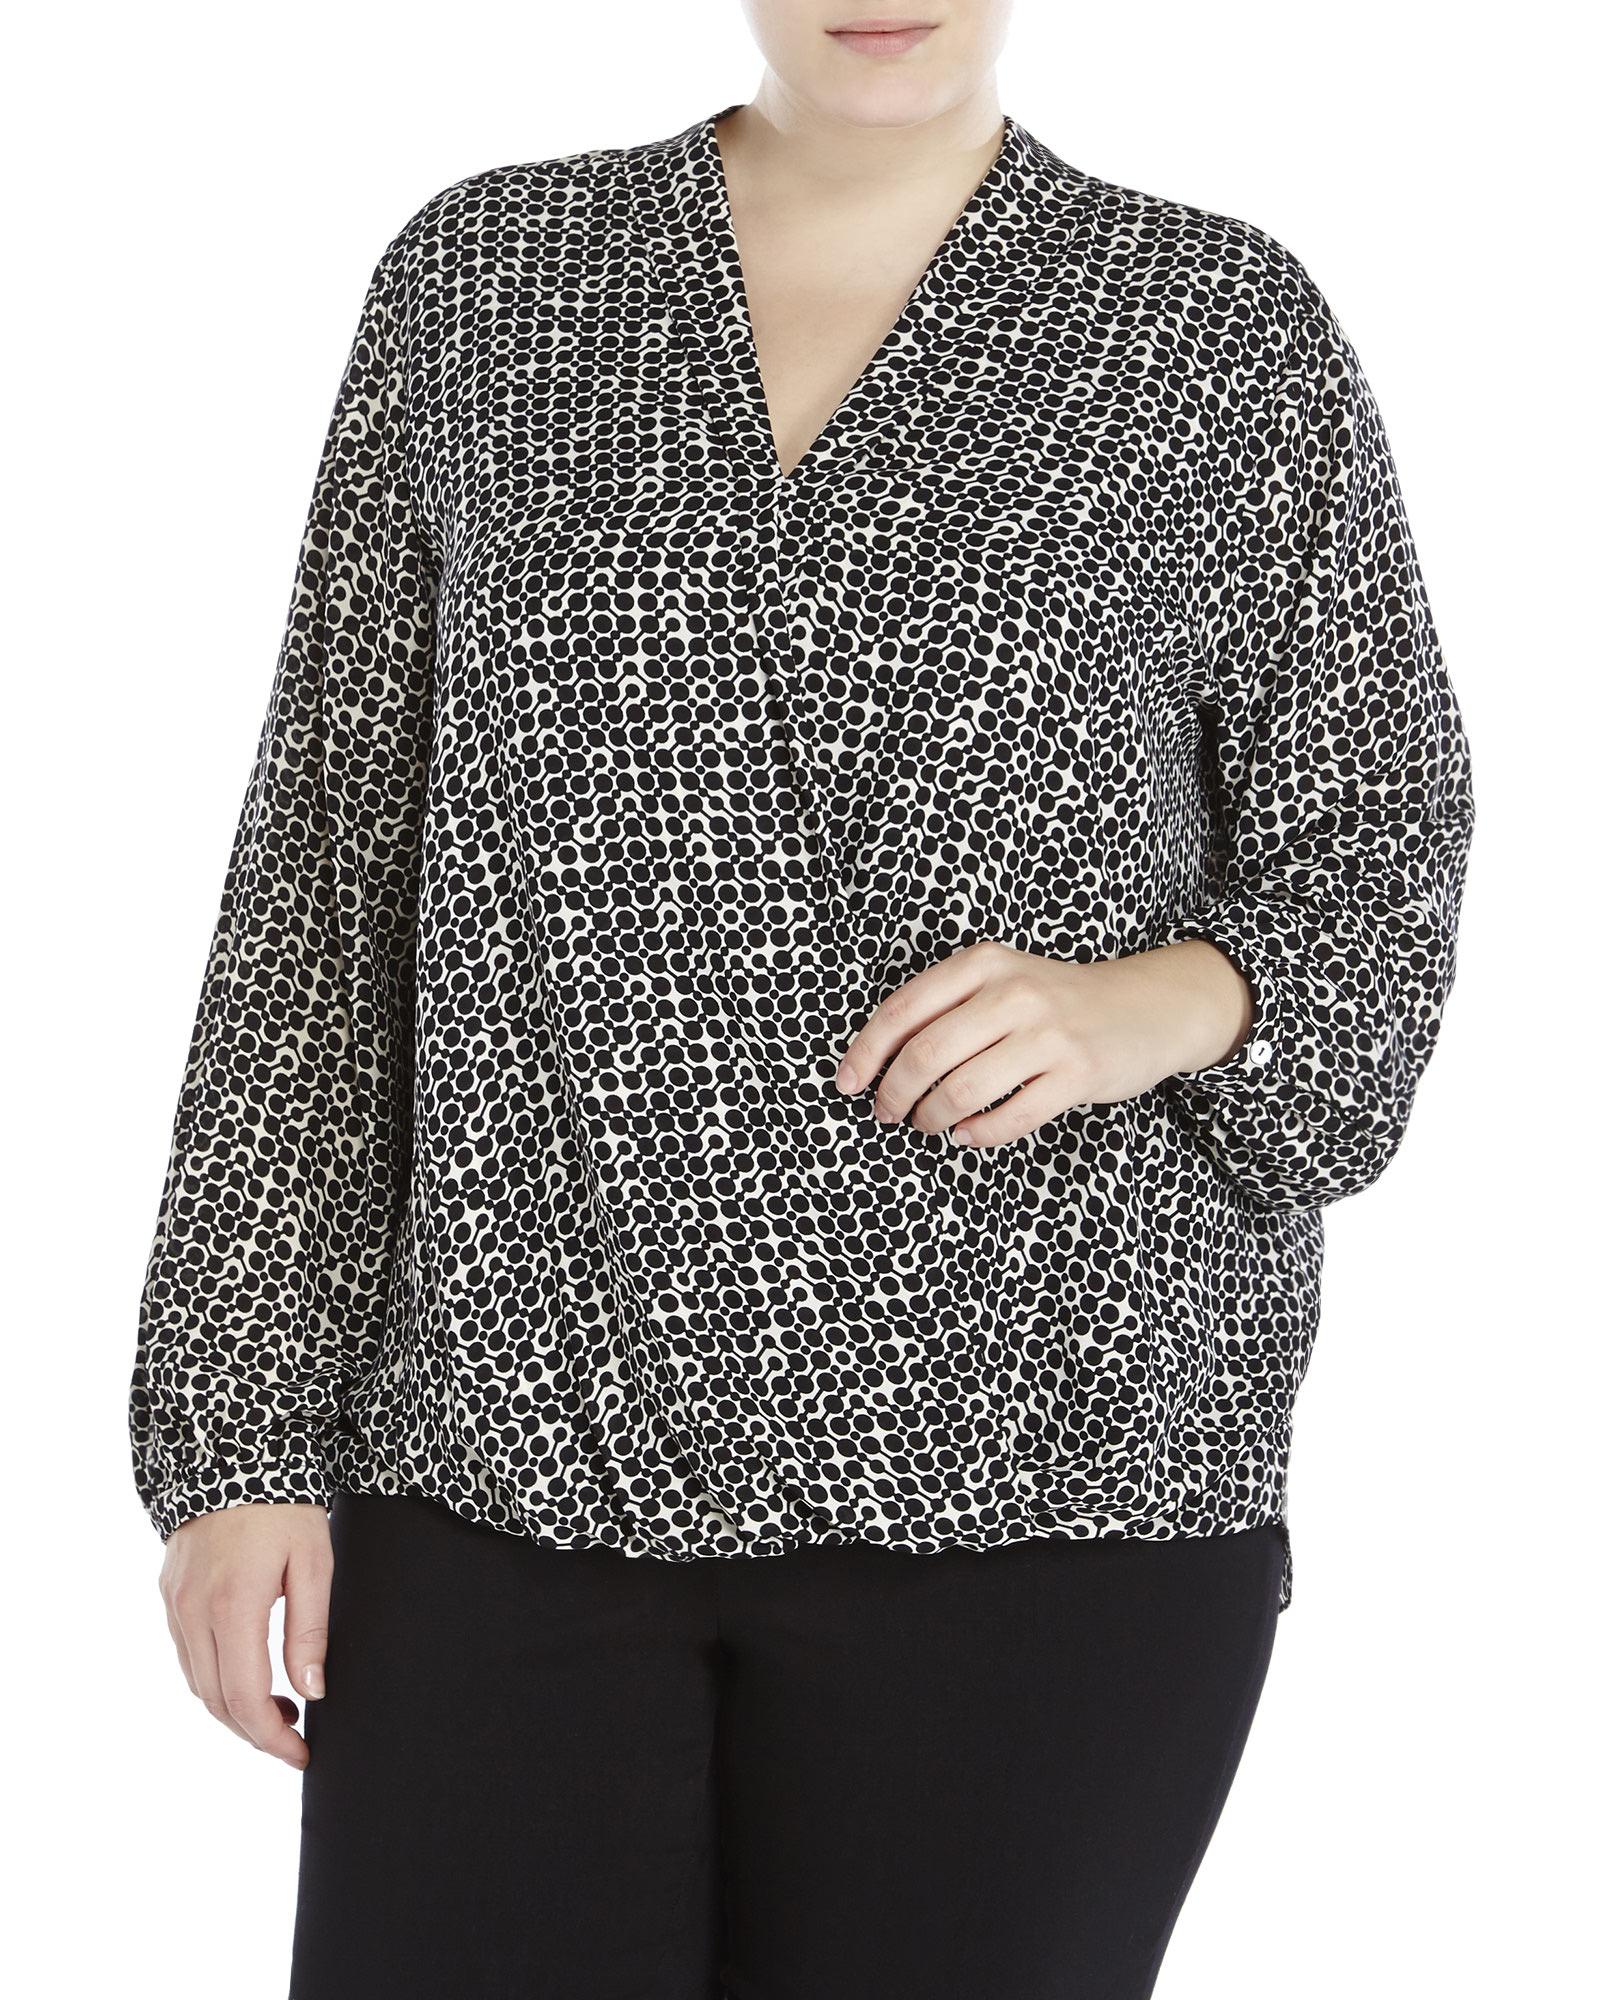 Chelsea Studio - Scoop neck tee - Women's Plus Size Clothing,